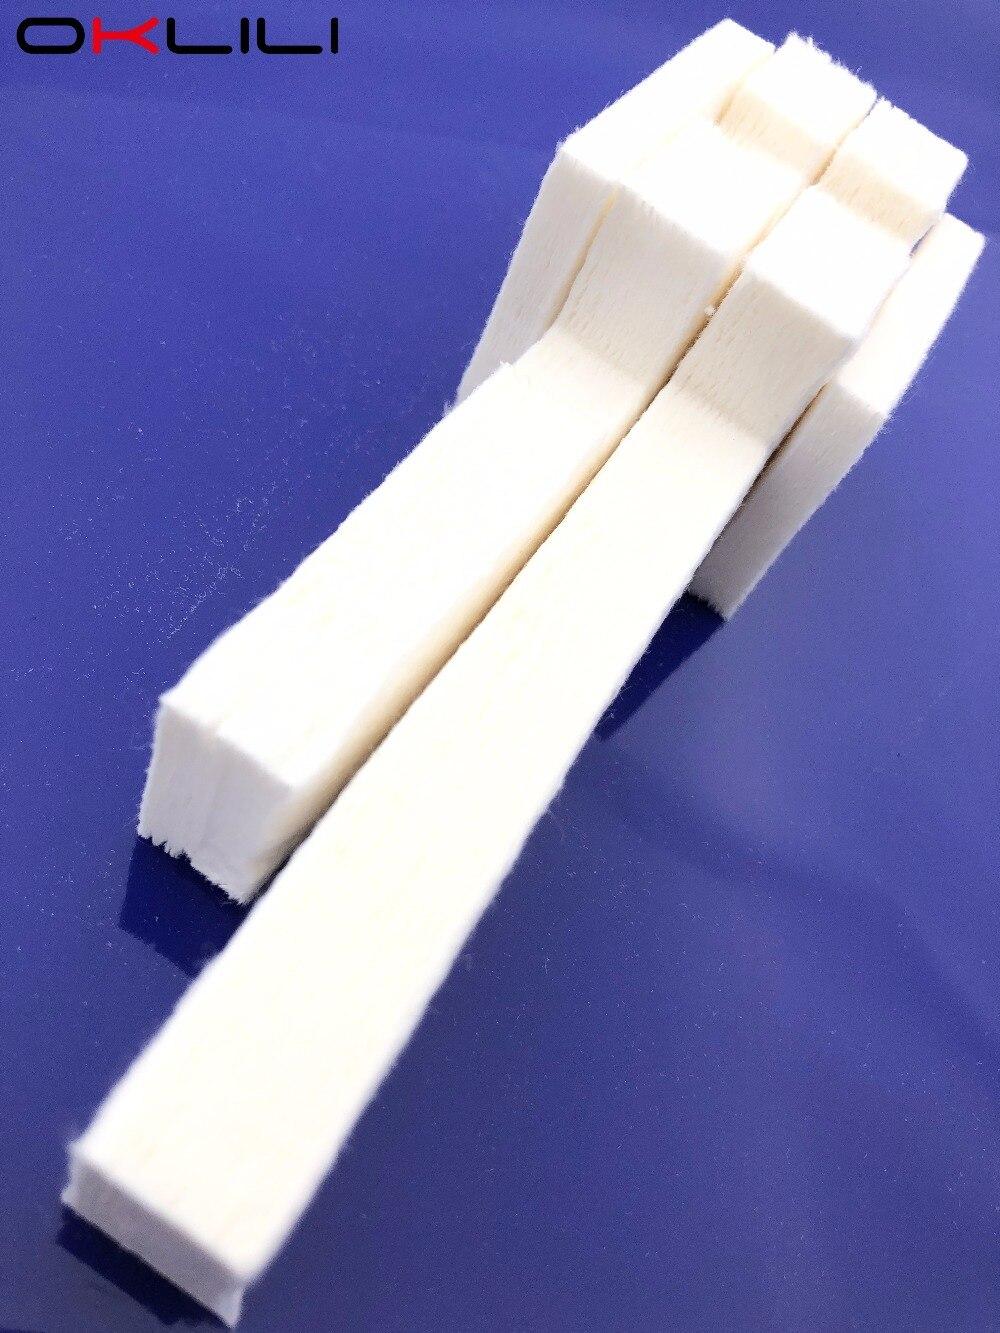 10SET X Waste Ink Tank Pad Sponge For Epson L300 L301 L303 L310 L350 L351 L353 L358 L355 L111 L110 L210 L211 ME101 ME303 ME401